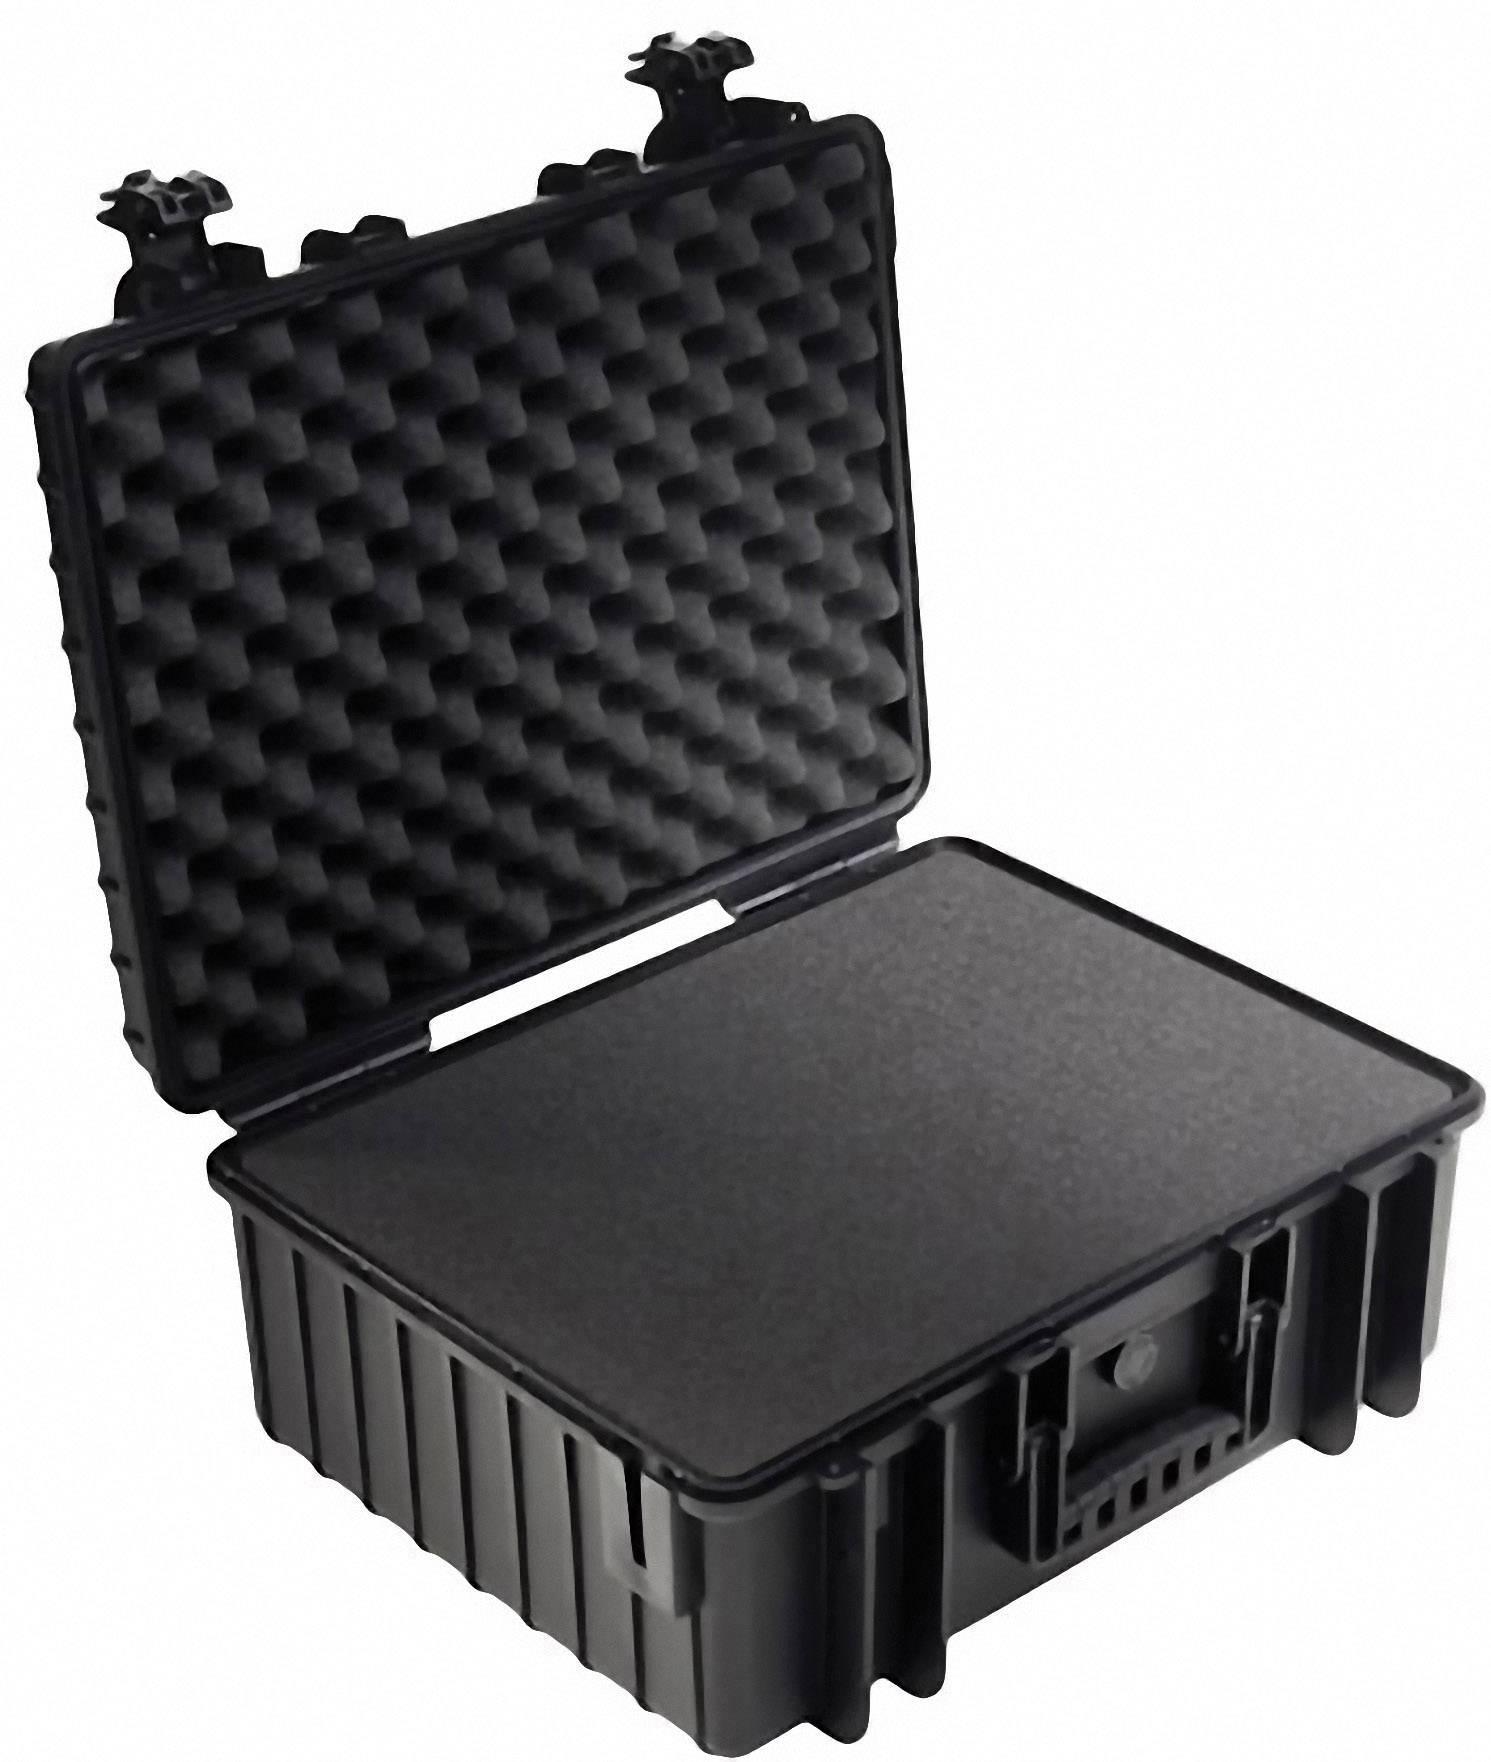 Ochranný kufr B & W 6700/B/SI rozměry: (š x v x h) 609 x 263 x 428 mm